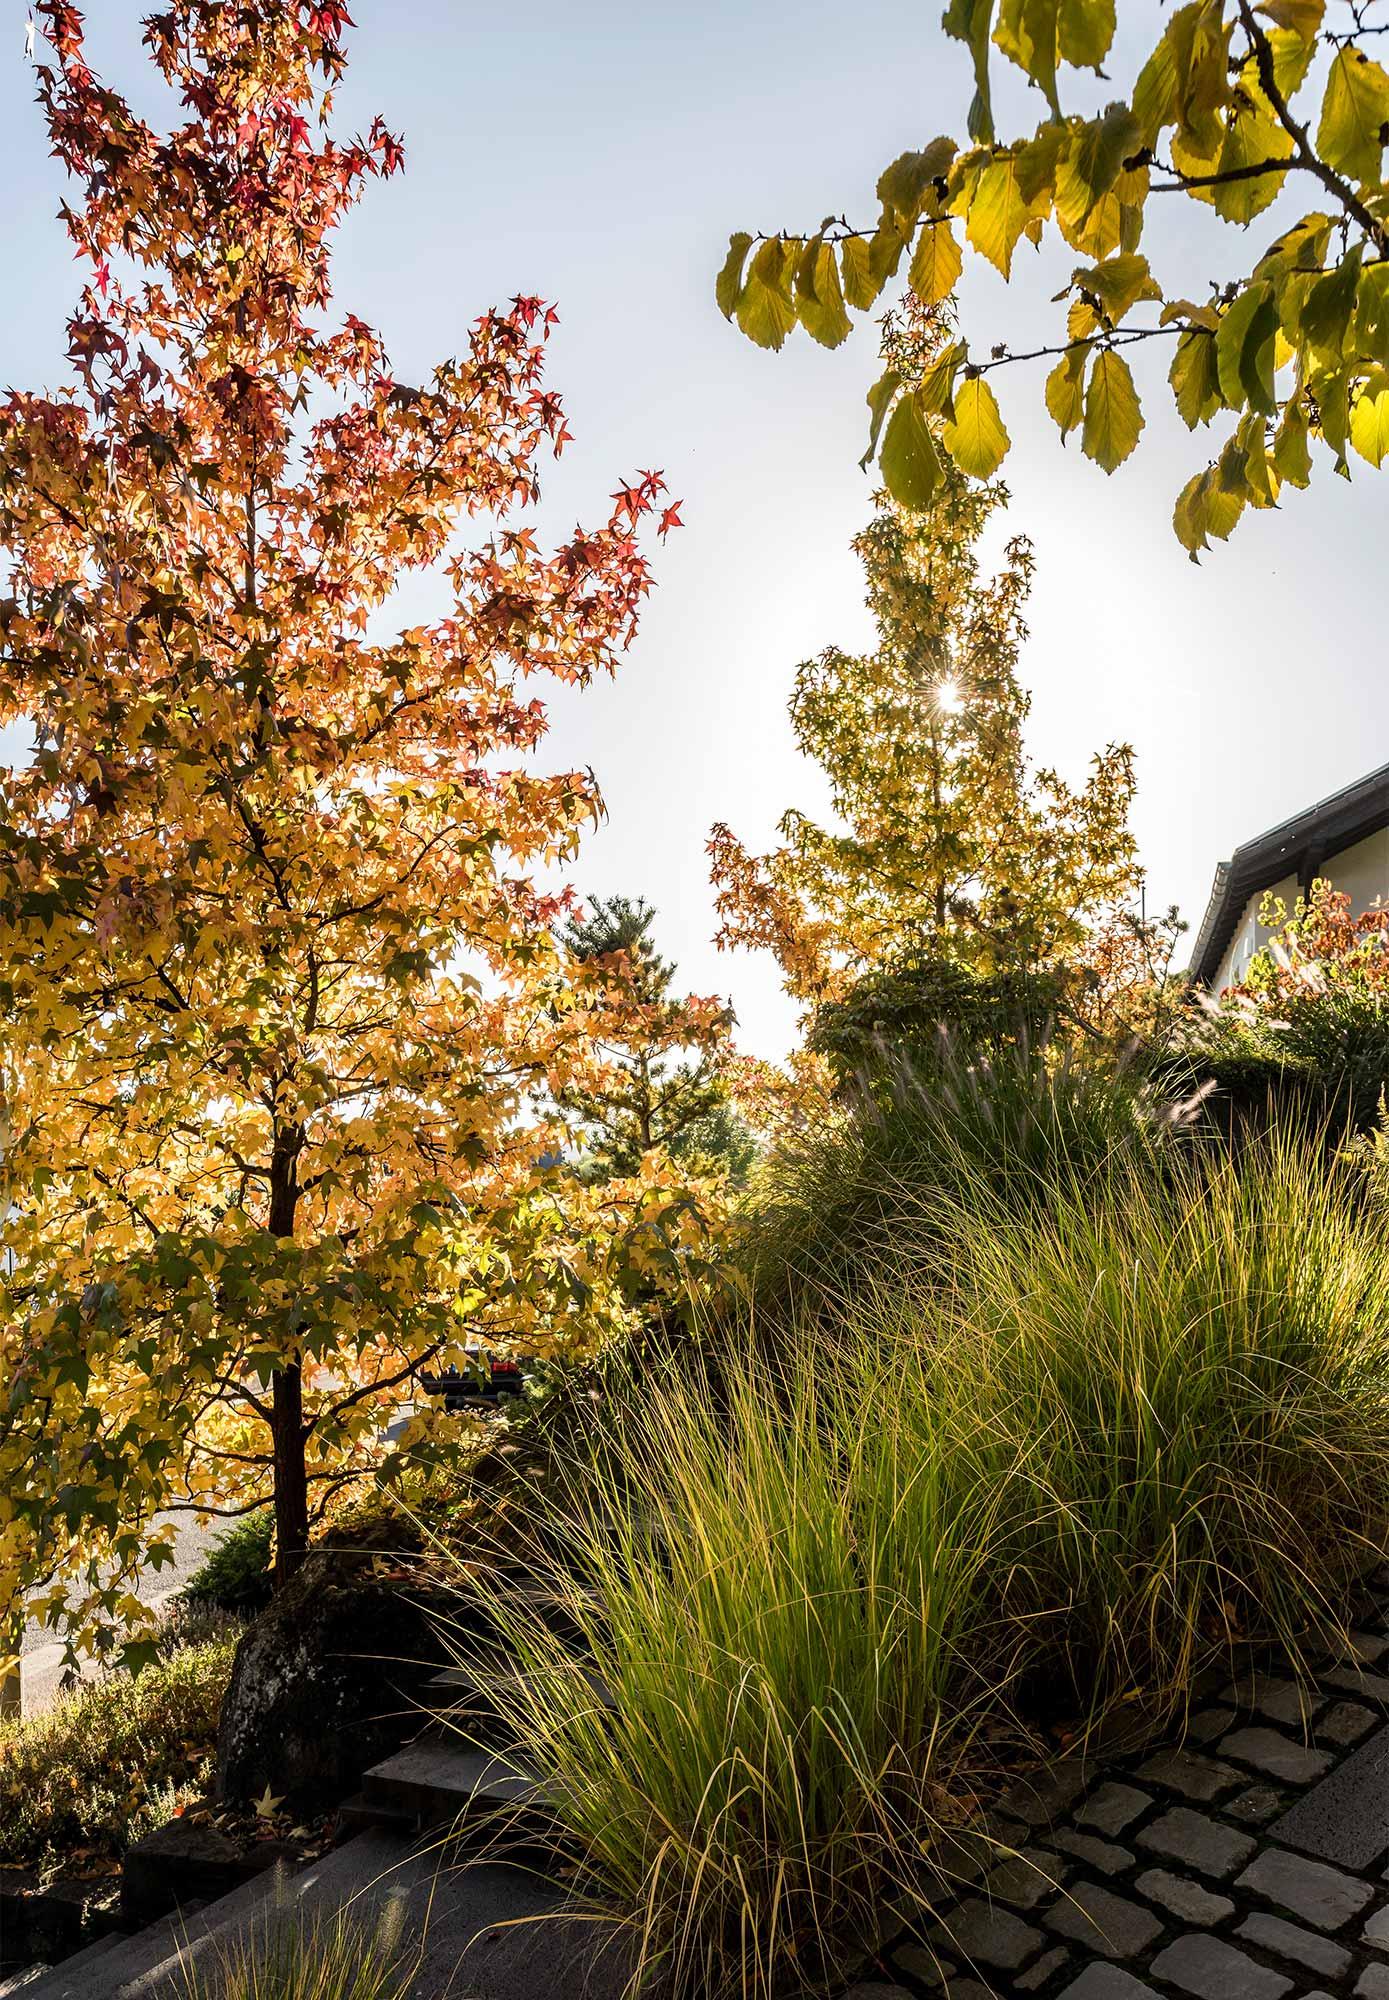 Japanese maple in front garden absorbing sunlight